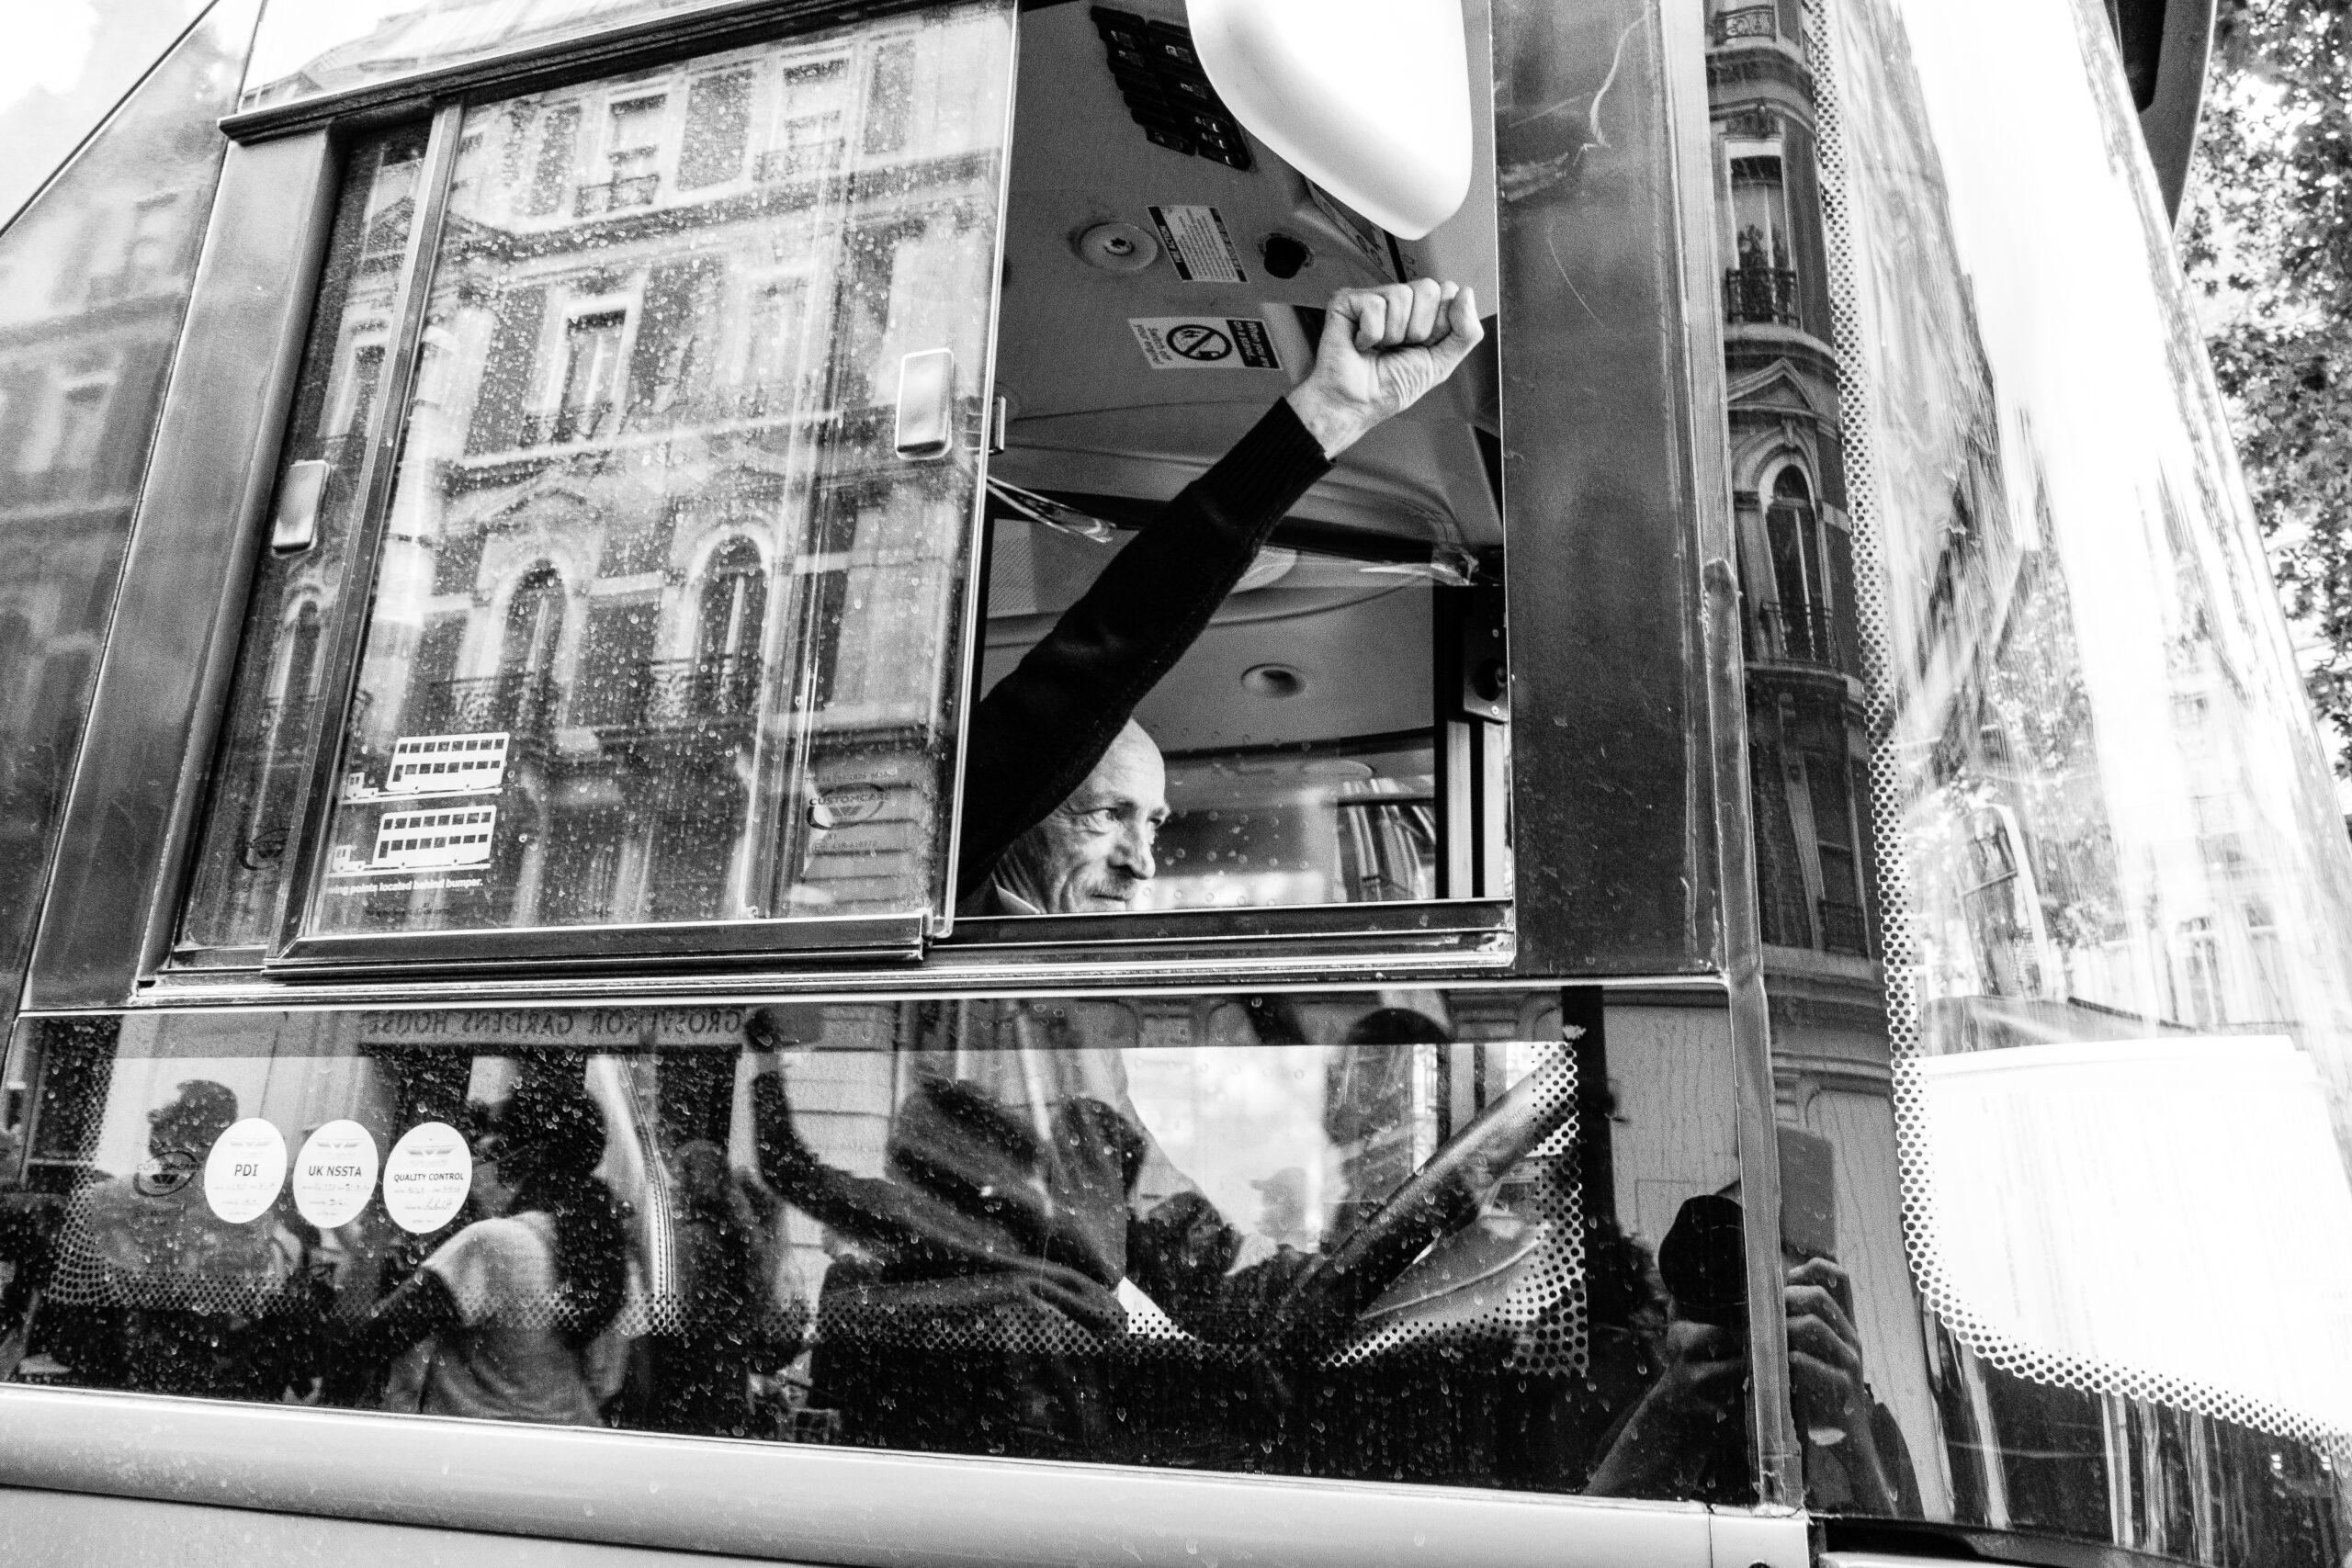 Black Lives Matter, protest London photojorunalism